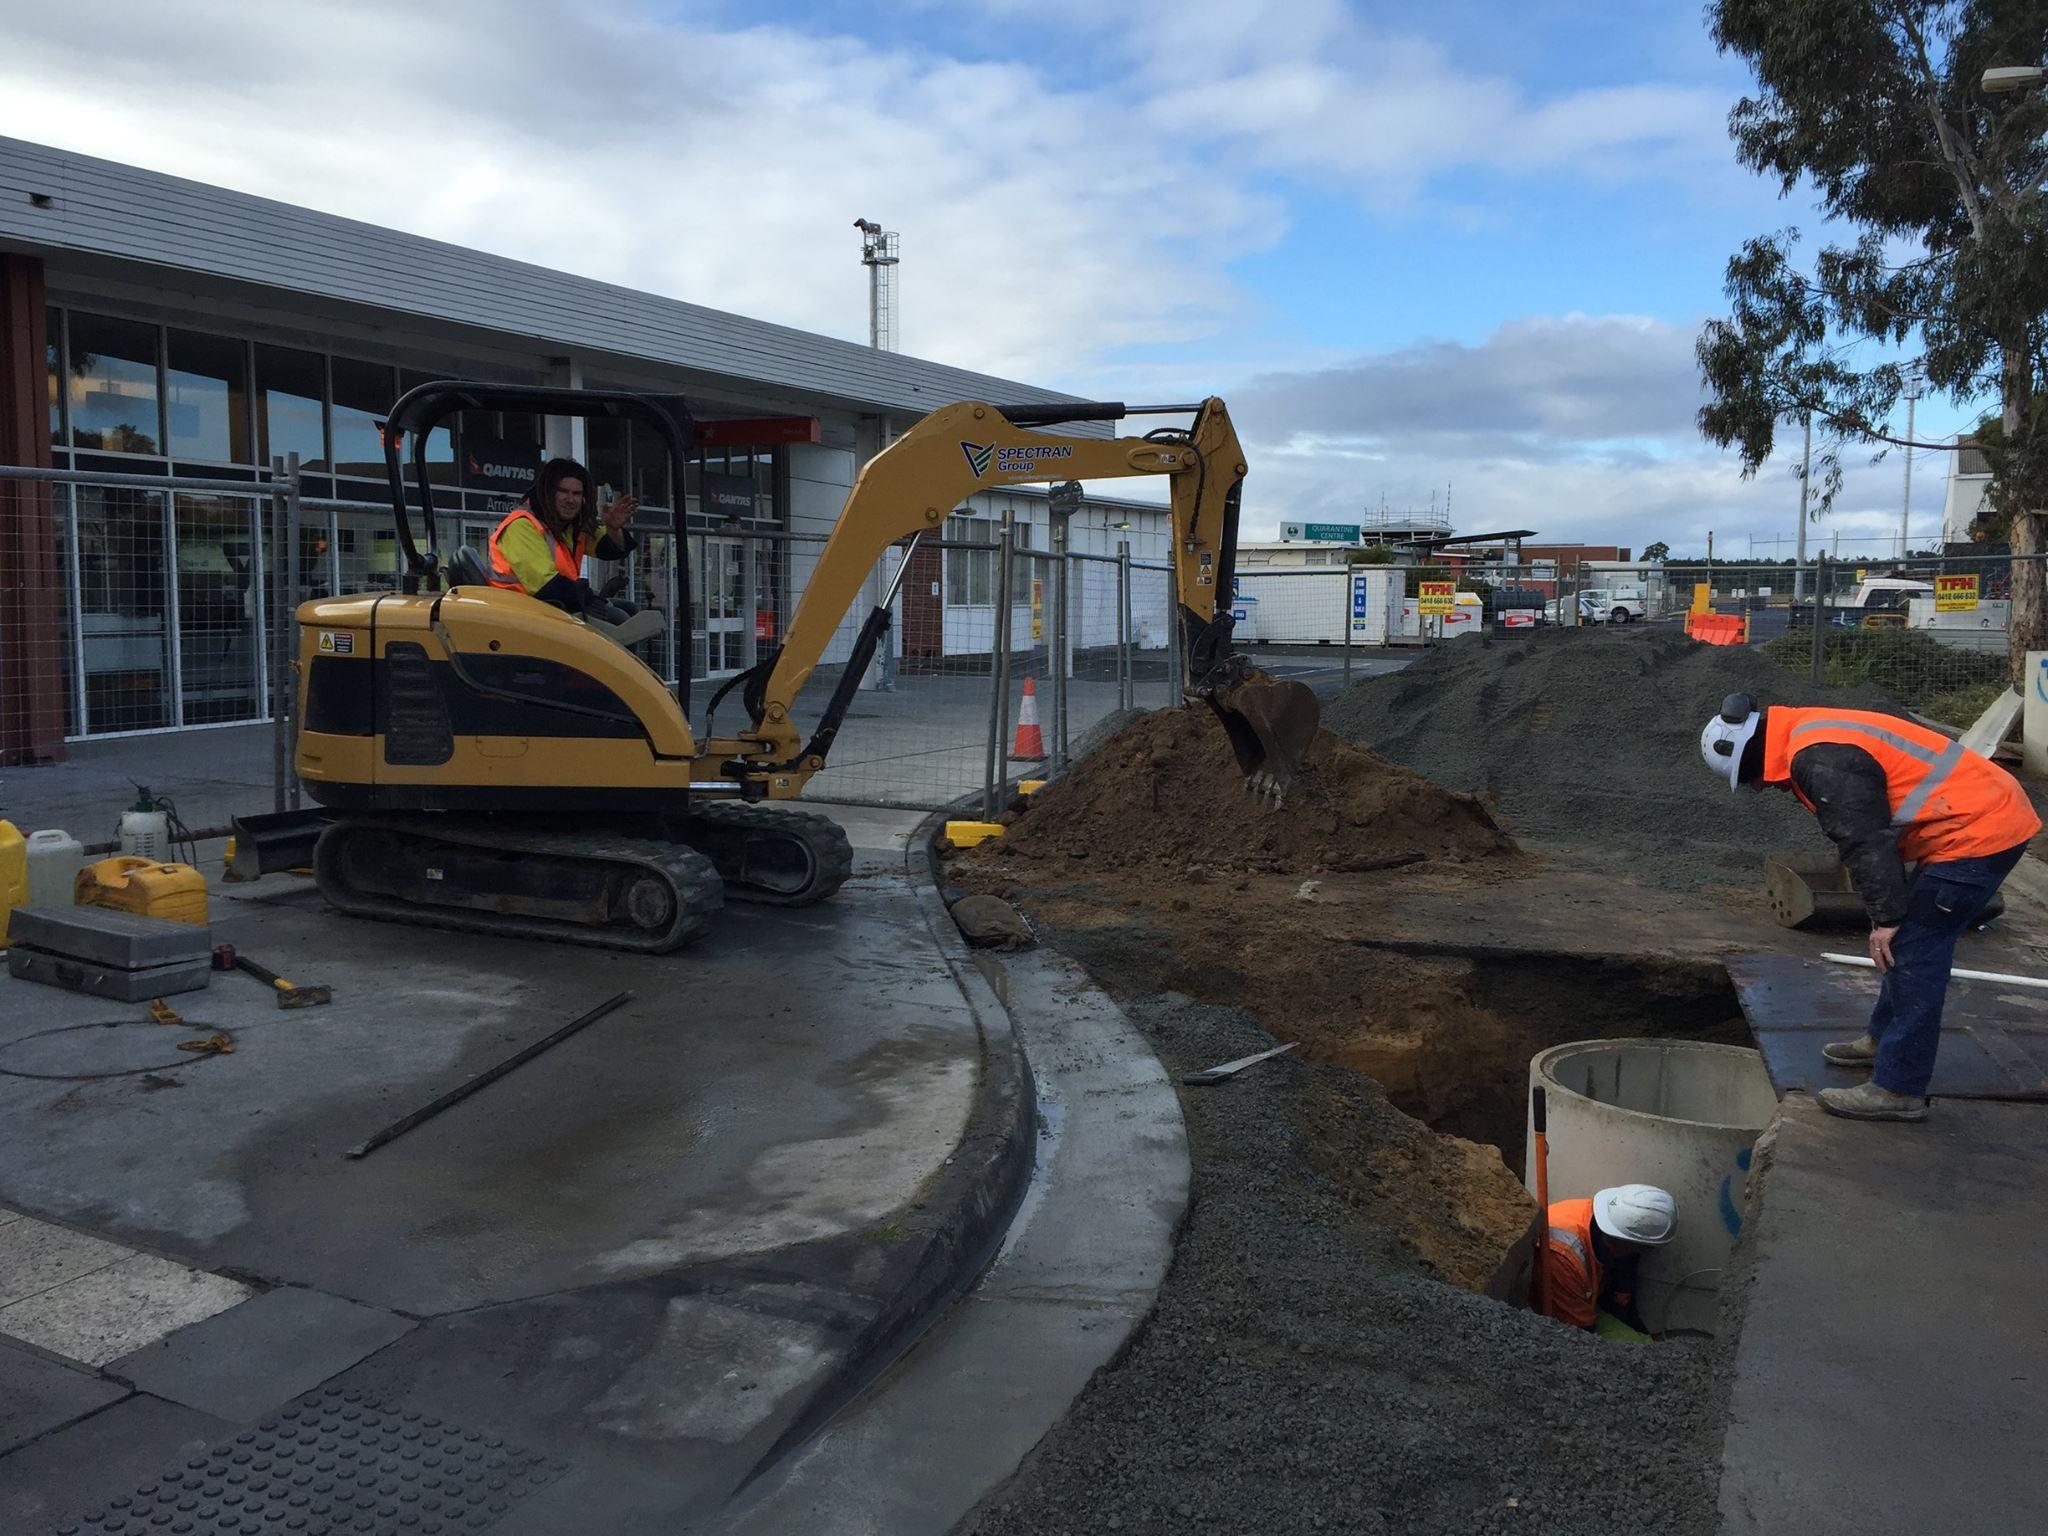 Spectran Group Commercial Pipeline Works Hobart